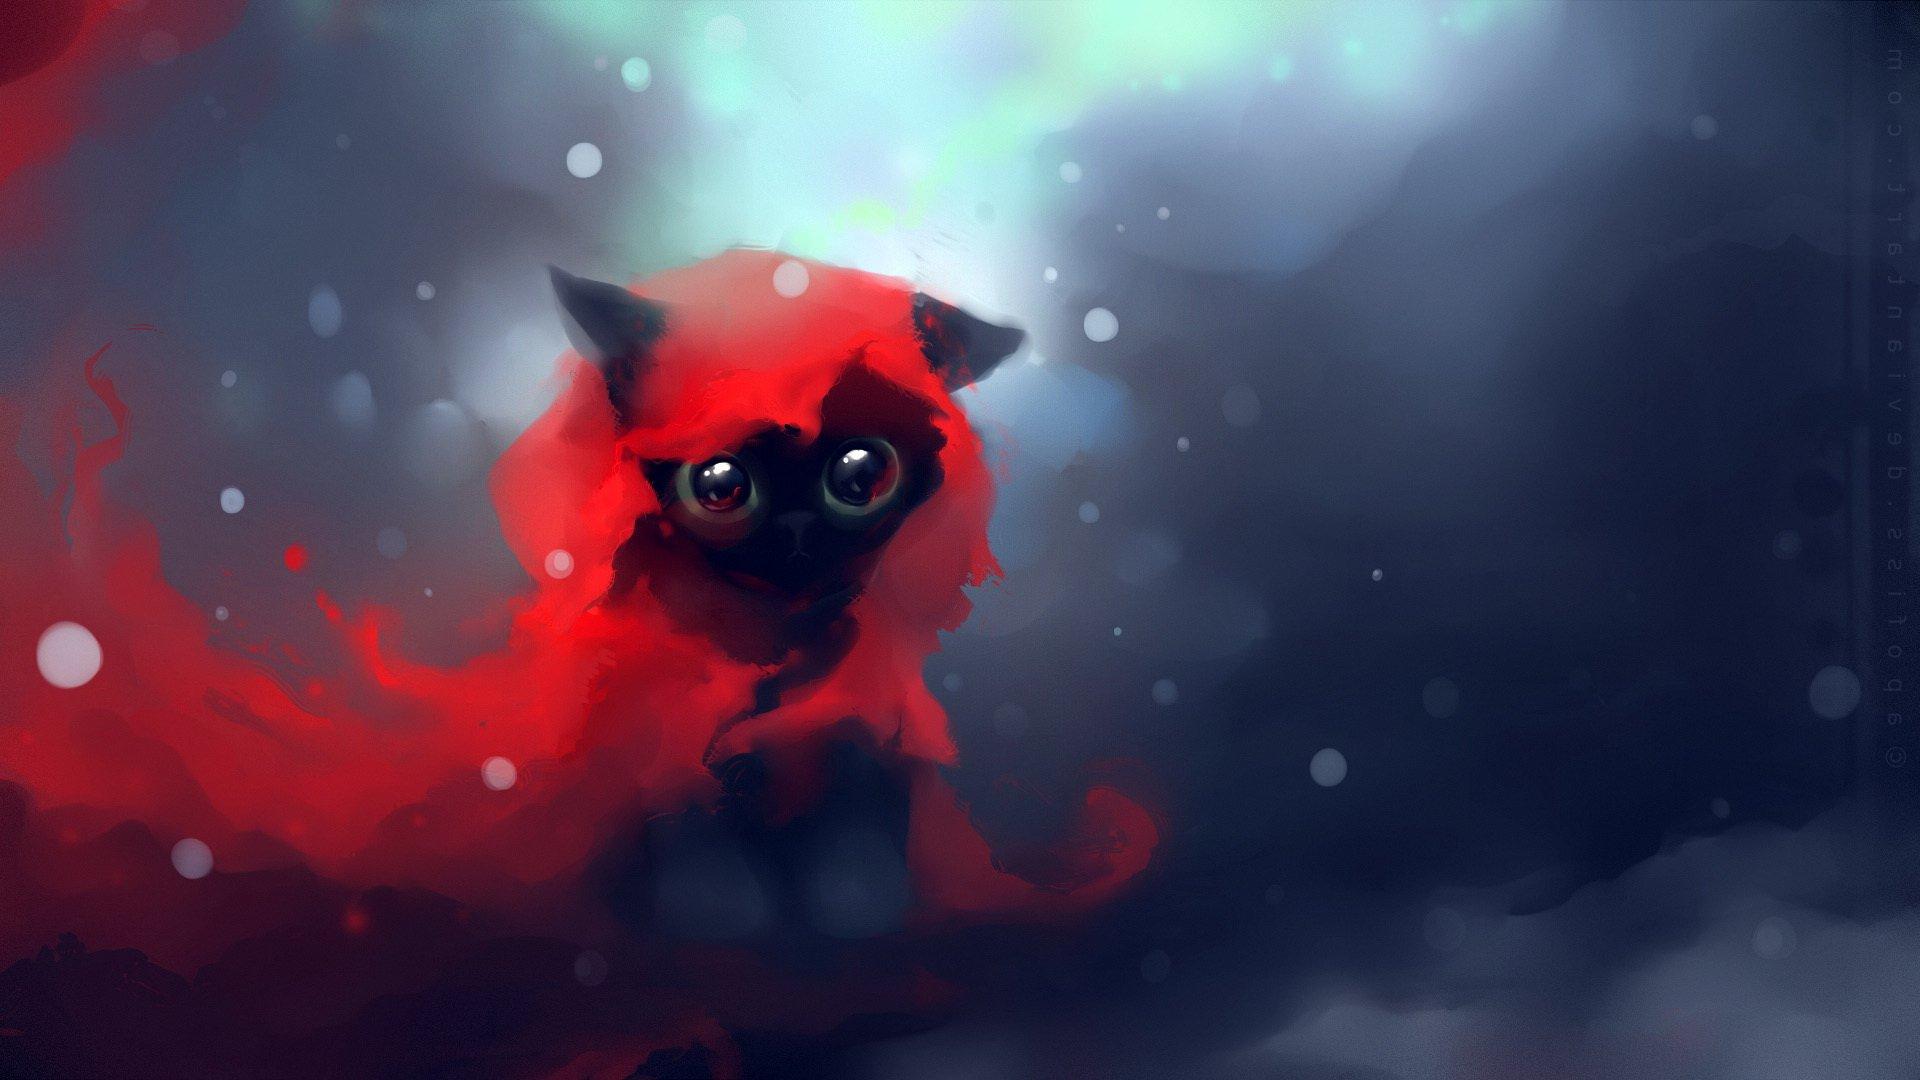 Cat Apofiss Cute Black Speed Painting Wallpaper Cartoon Kittens Heart Anime Original Images Touching Cuties